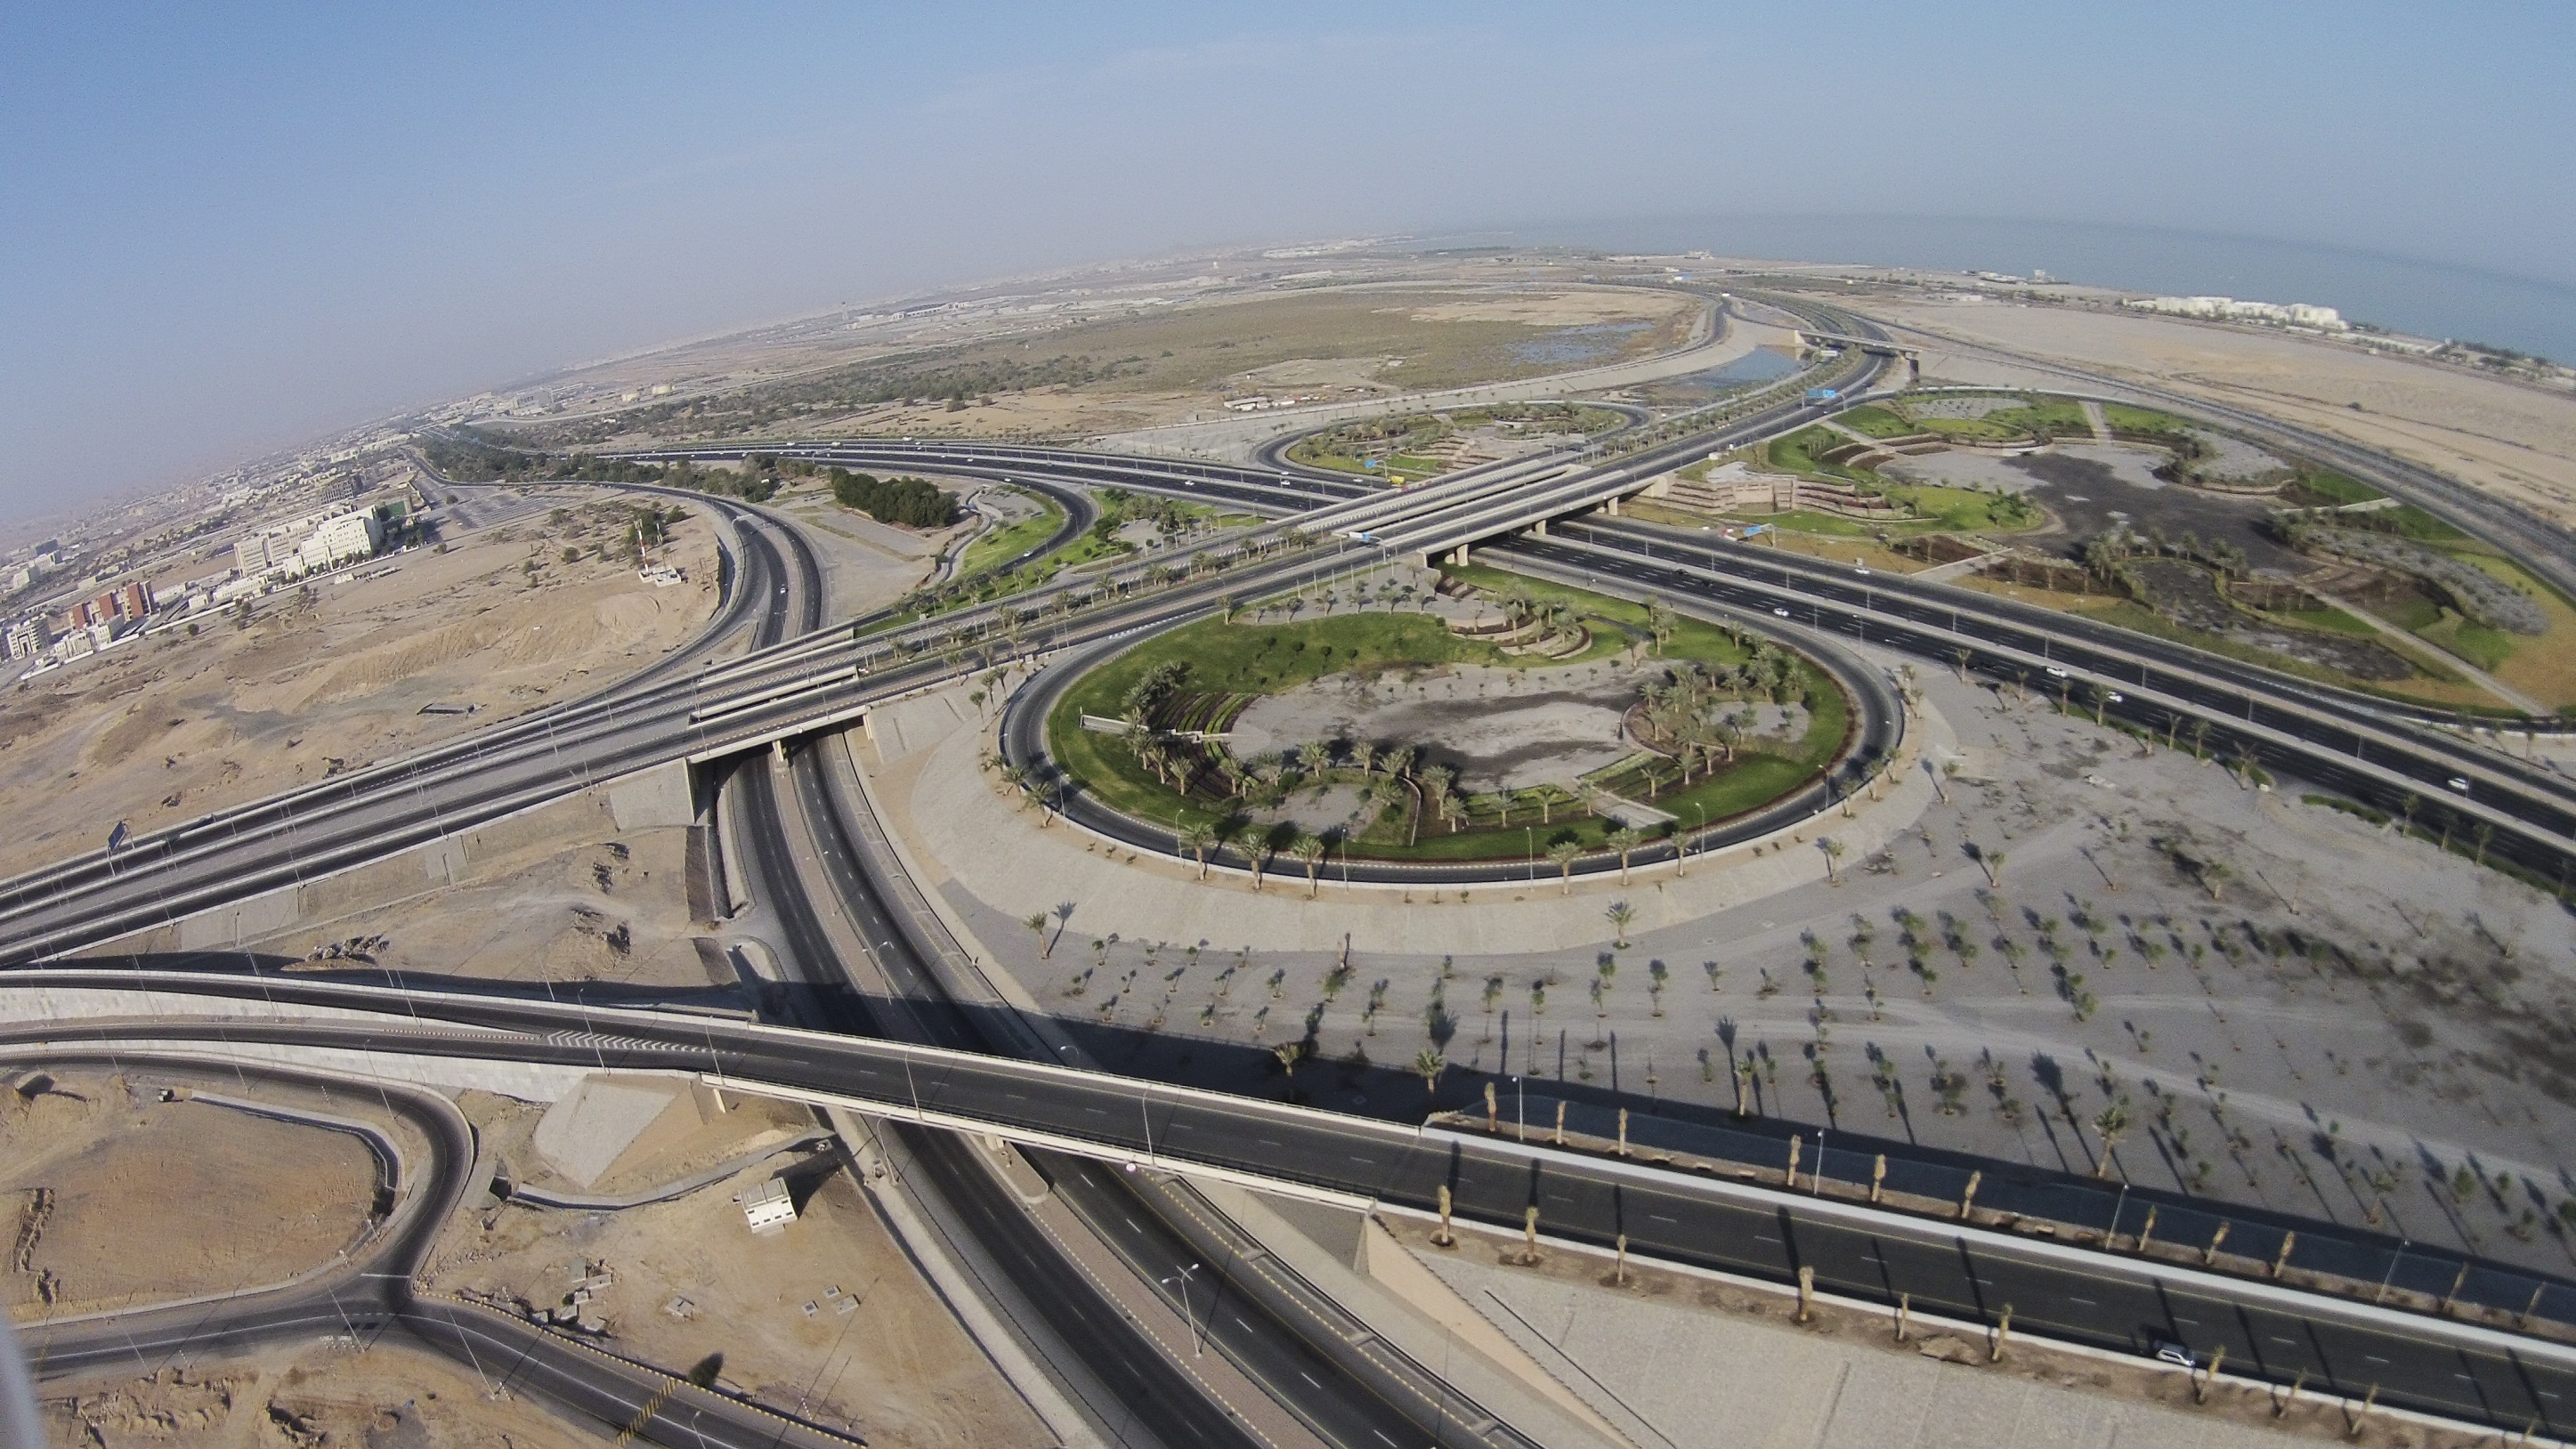 Photo of بالصور: الانتهاء من تنفيذ مشروعات طرق حيوية ترتبط بمطار مسقط الجديد